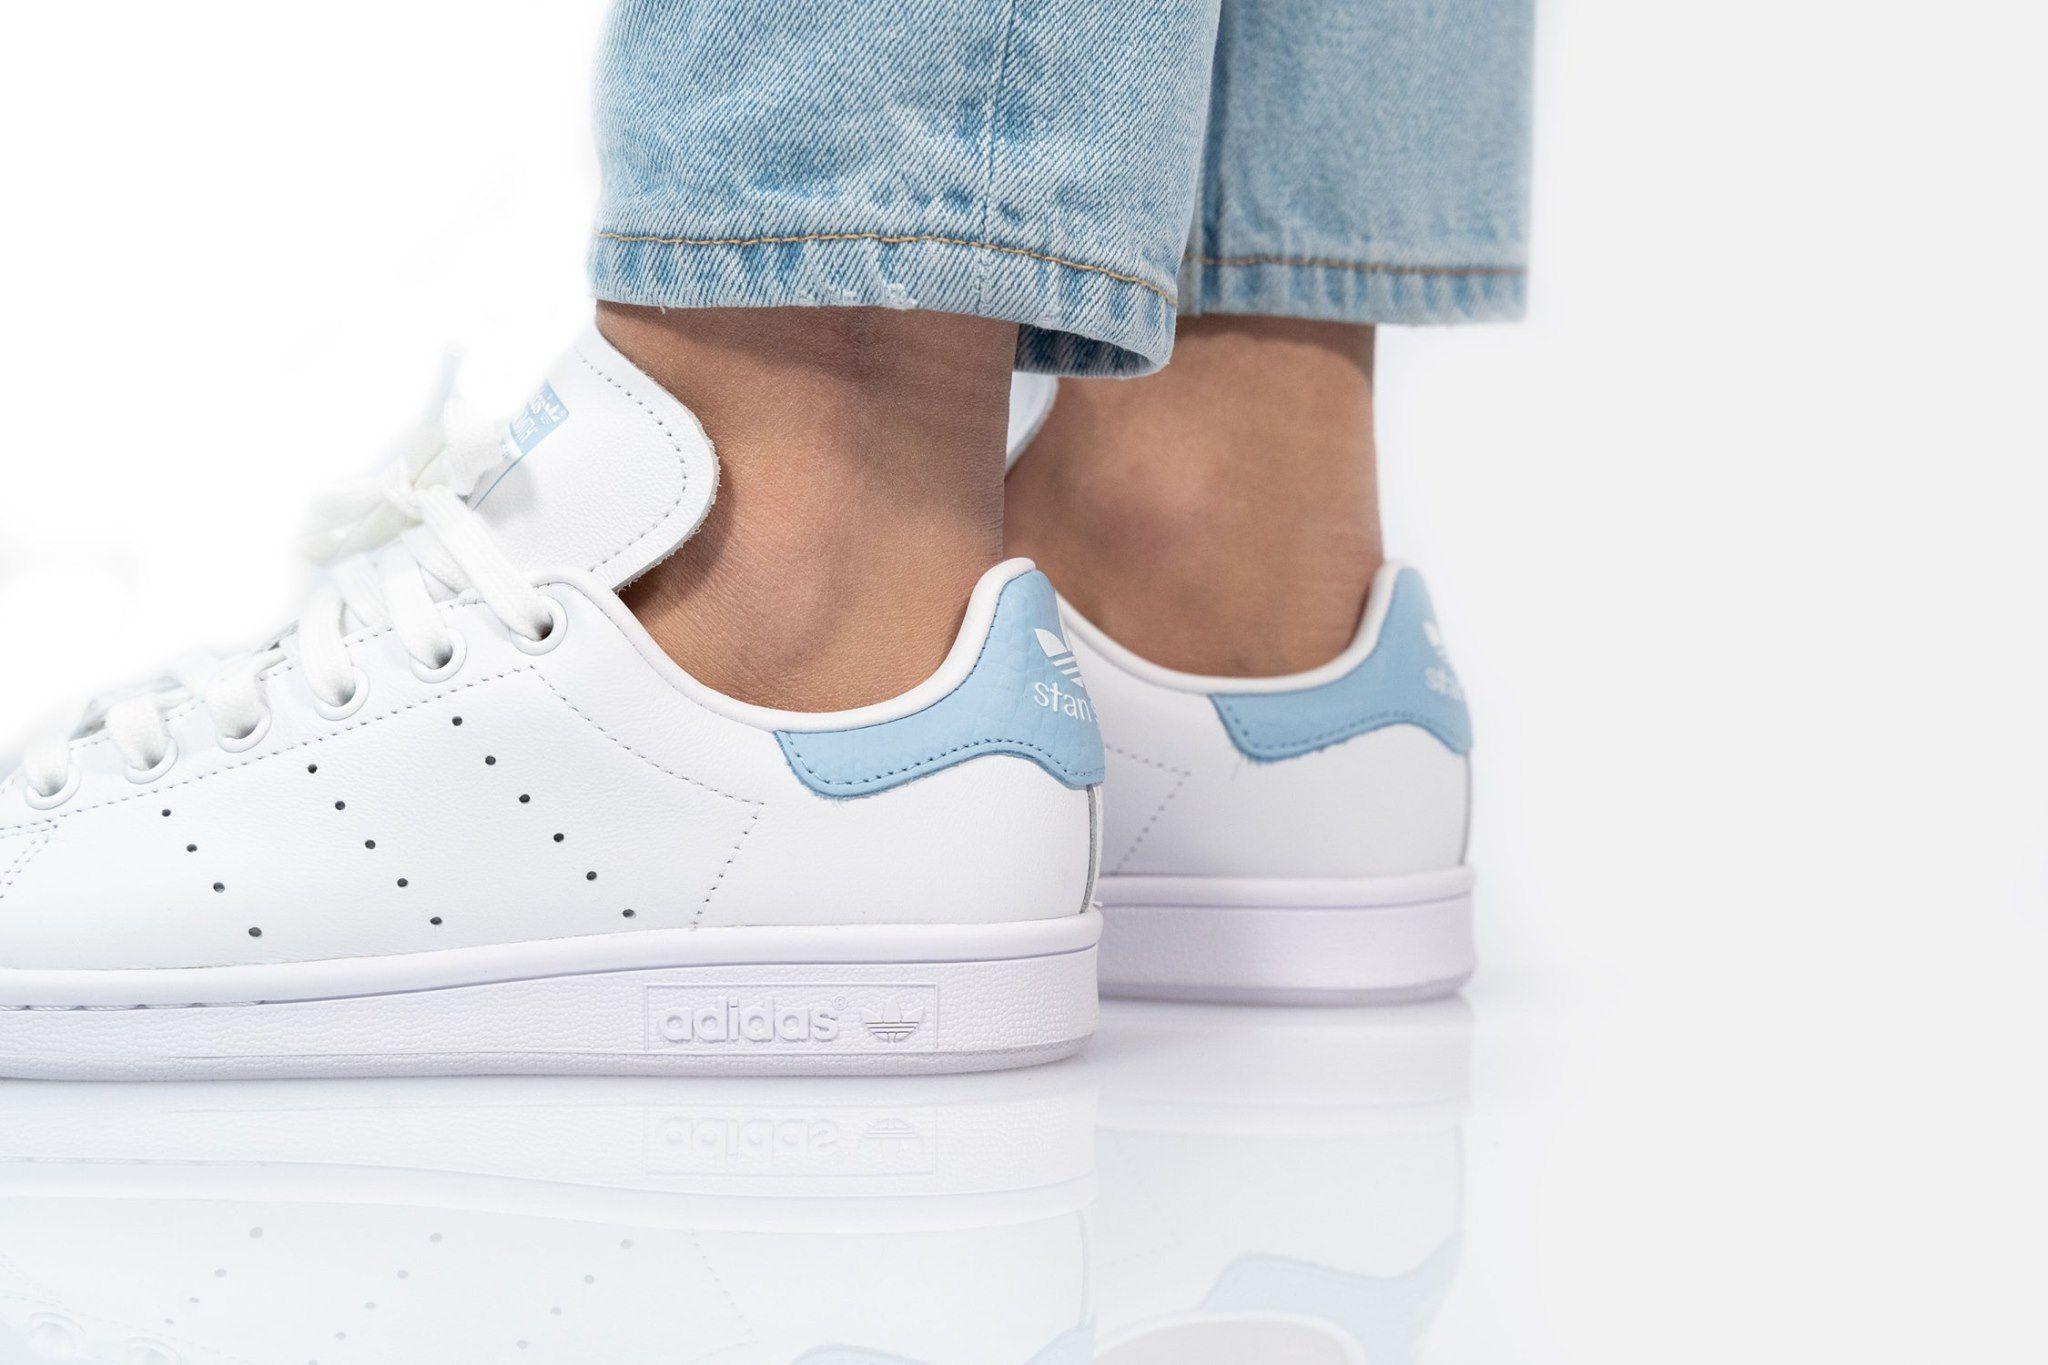 adidas *Wmns Stan Smith* Jumpnshoez #JNS #sneaker #fashion